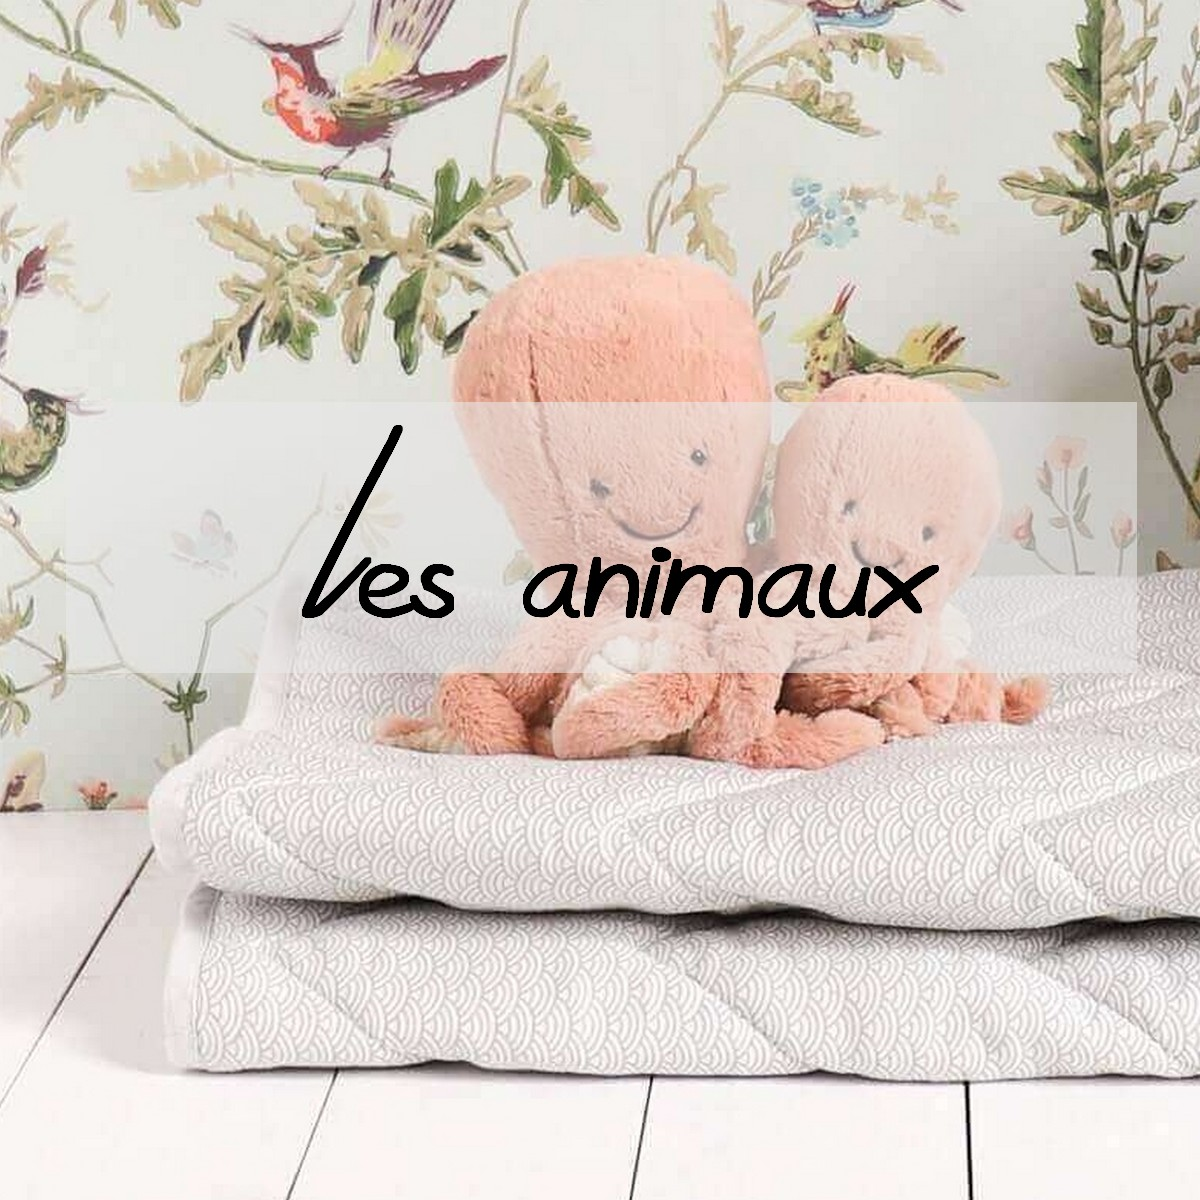 les_animaux_javotine_jellycat.jpg